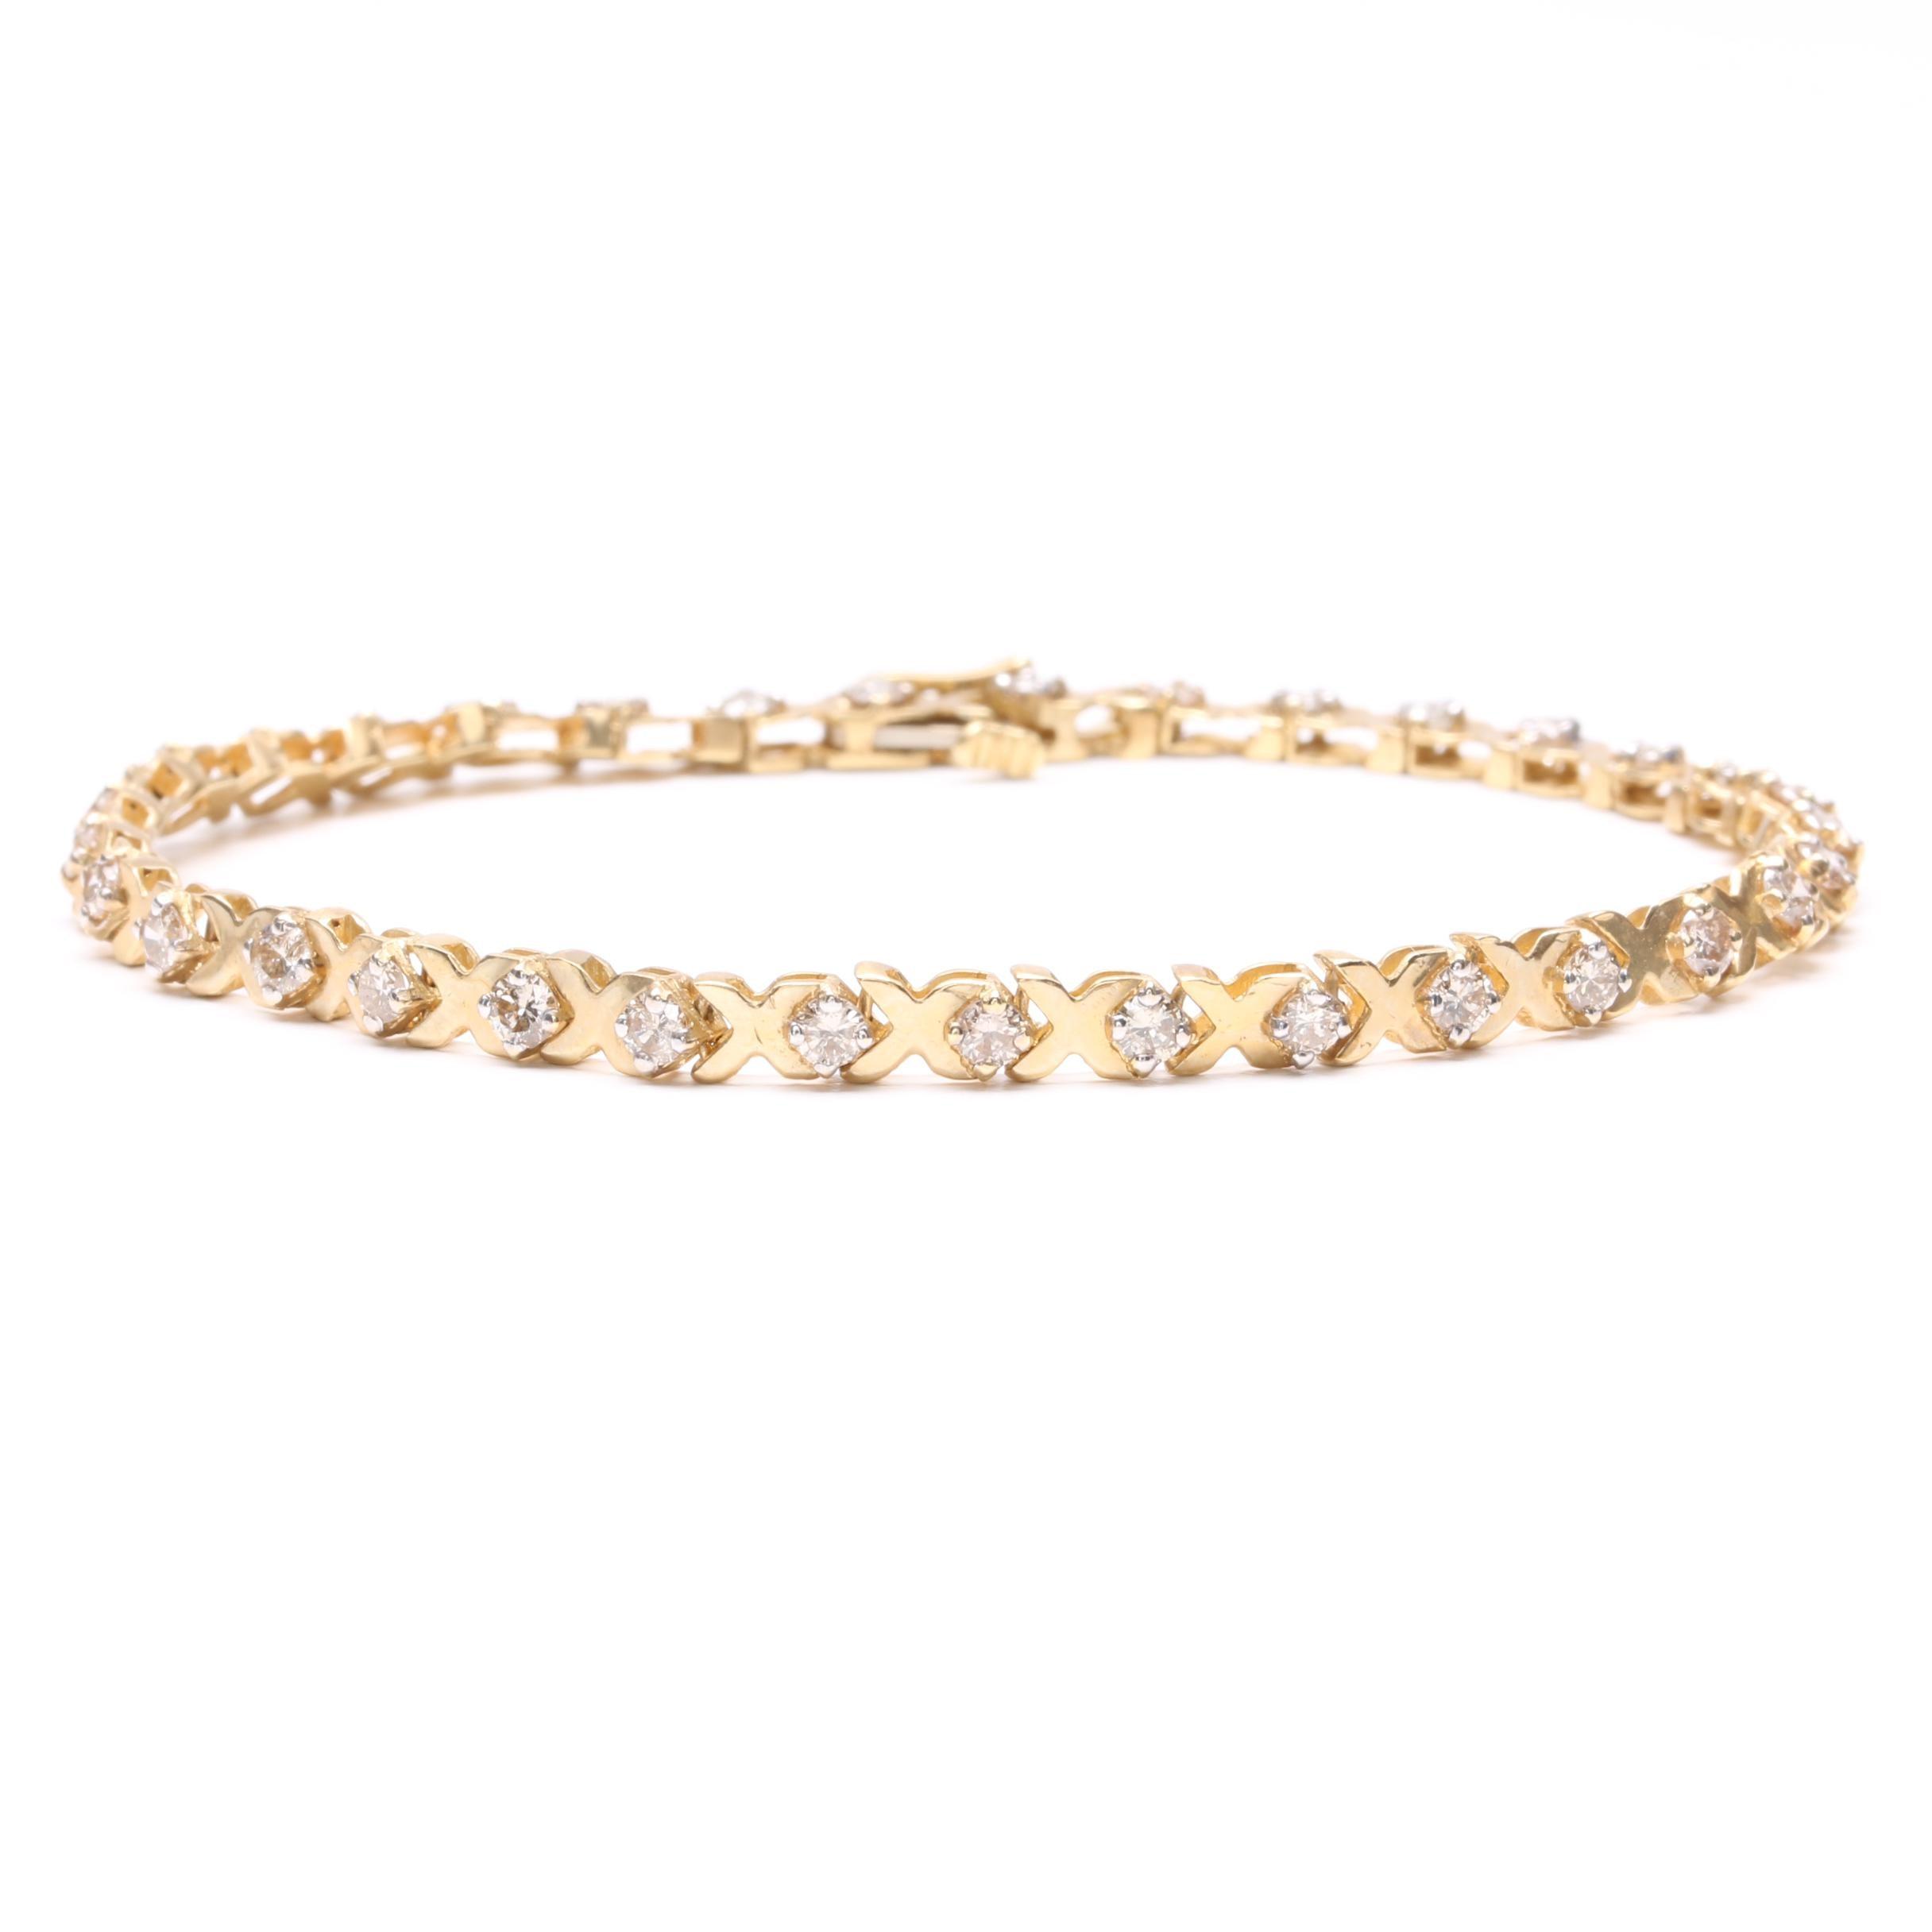 14K Yellow Gold 1.98 ctw Diamond Tennis Bracelet